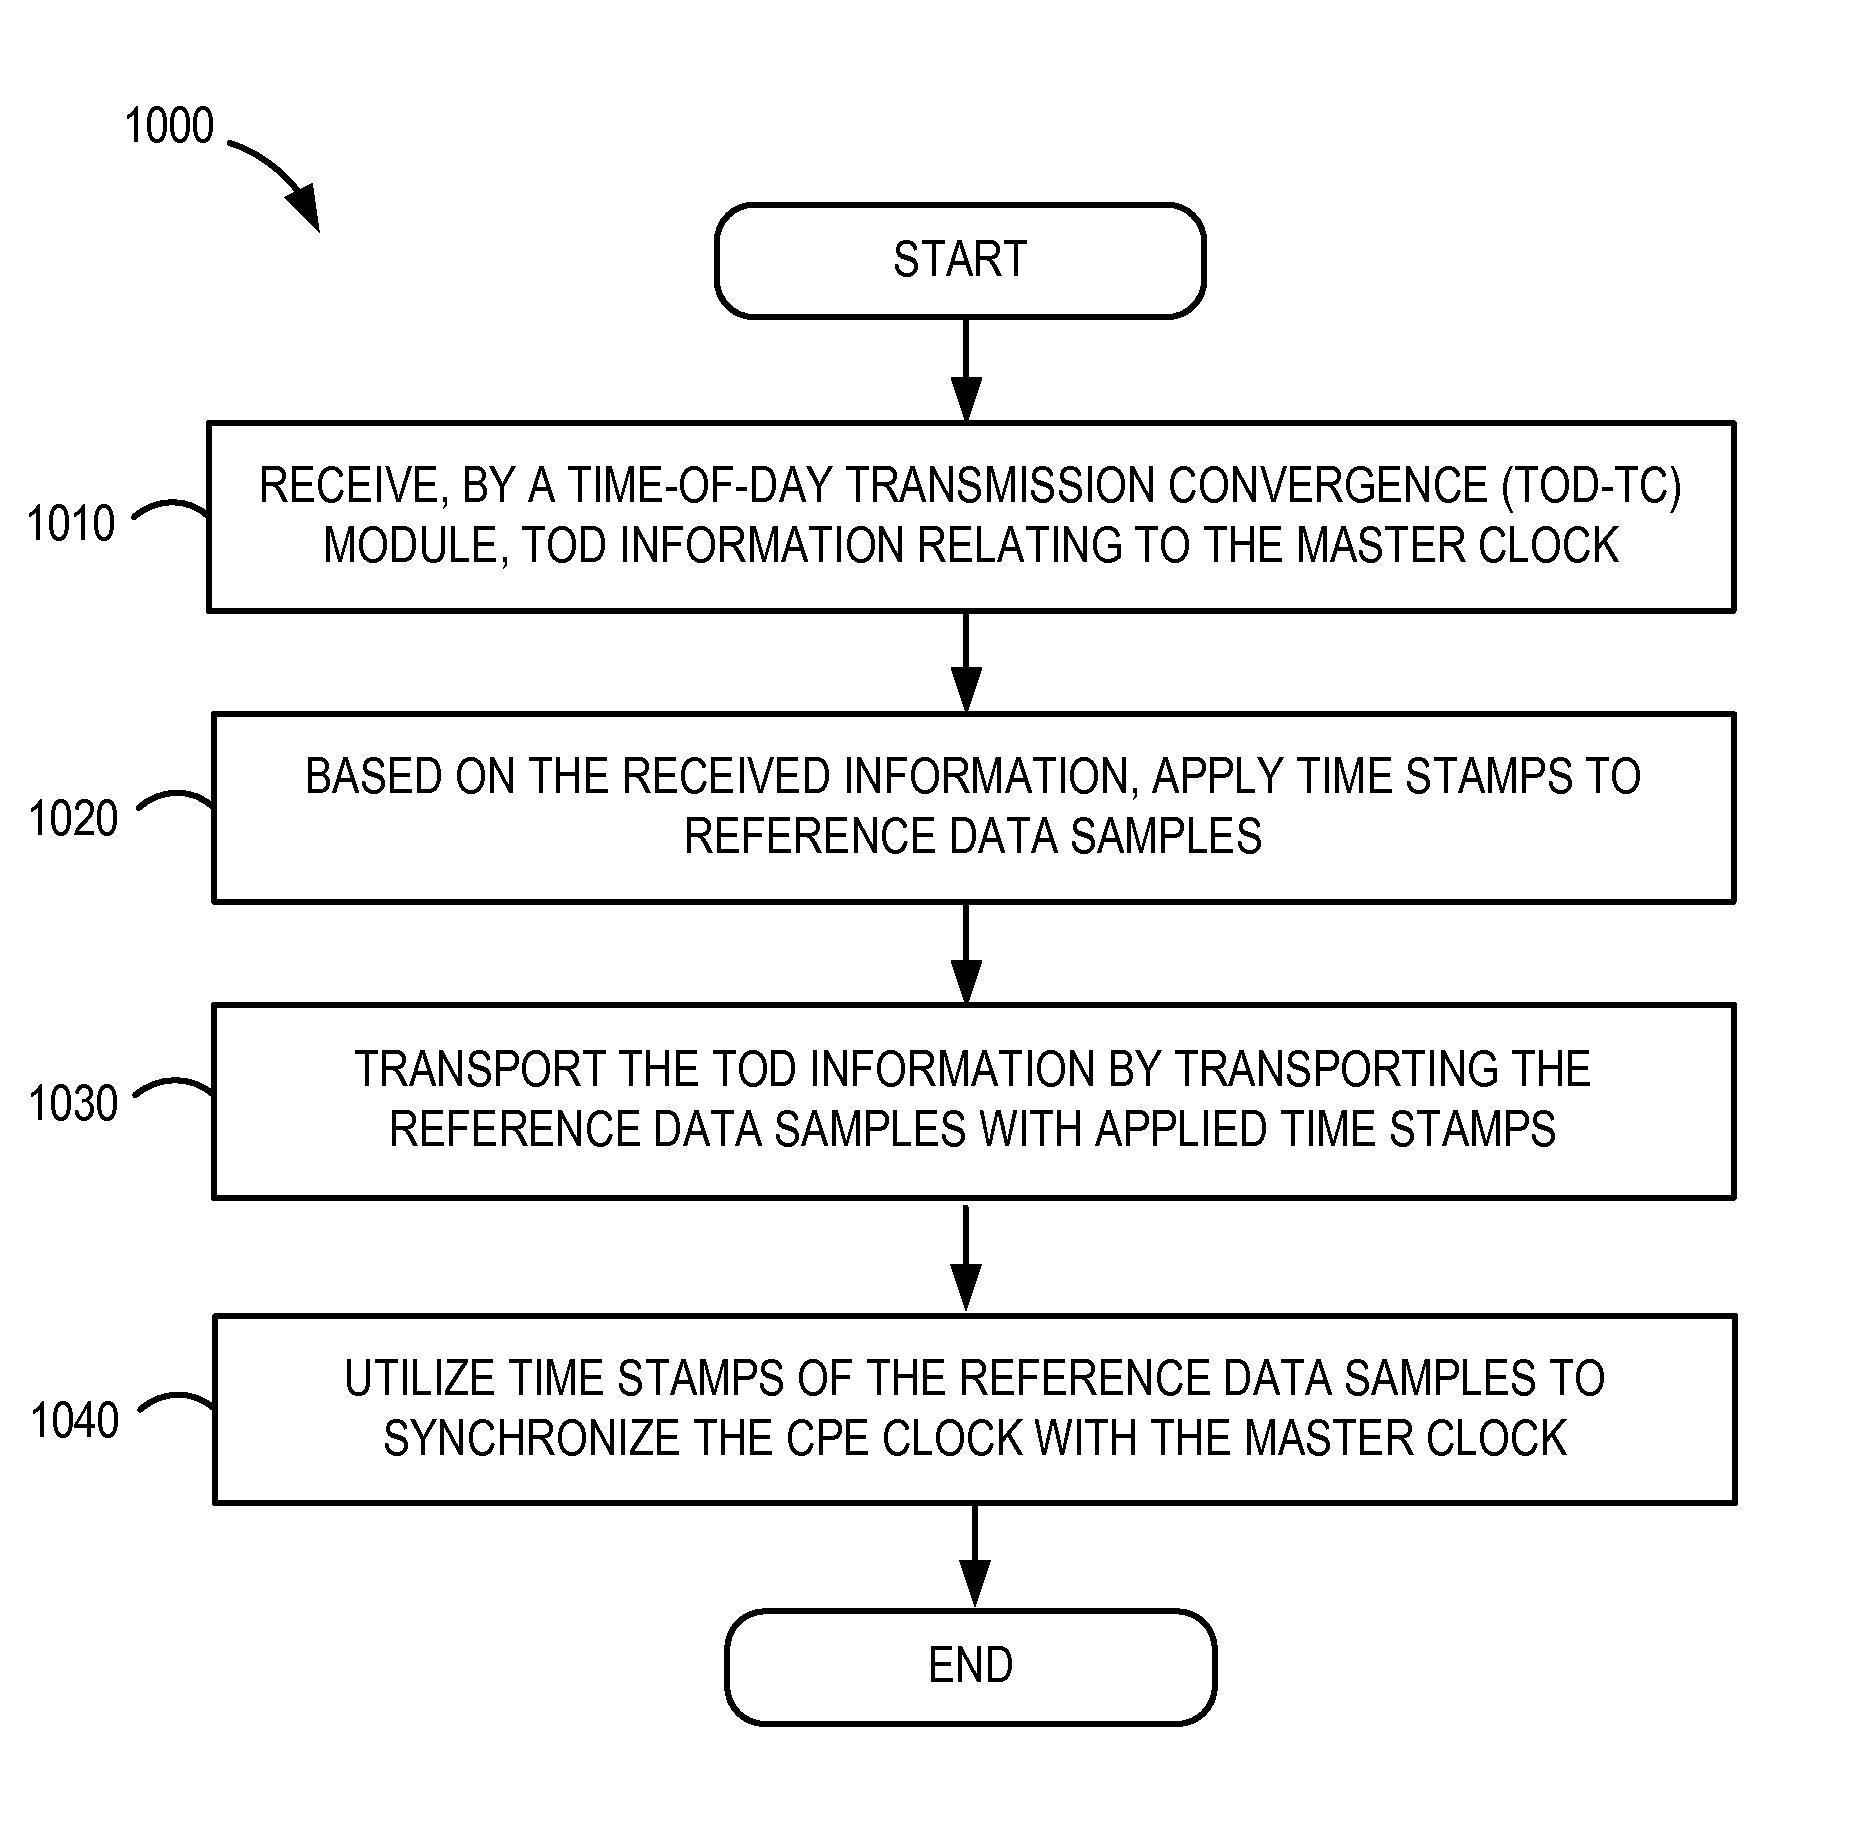 Patent US 8,775,849 B2